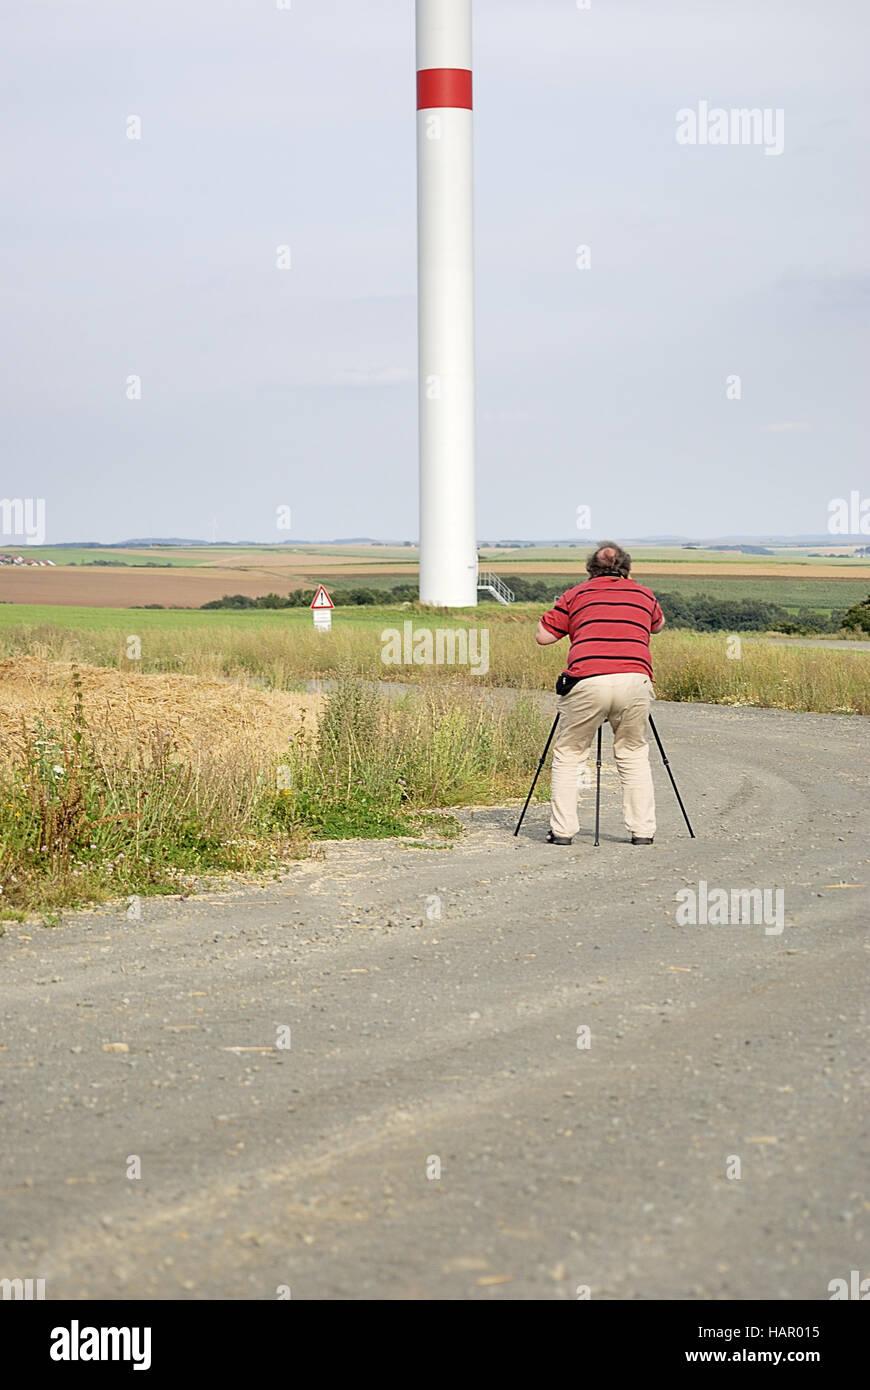 Fotograf-photograph Stock Photo